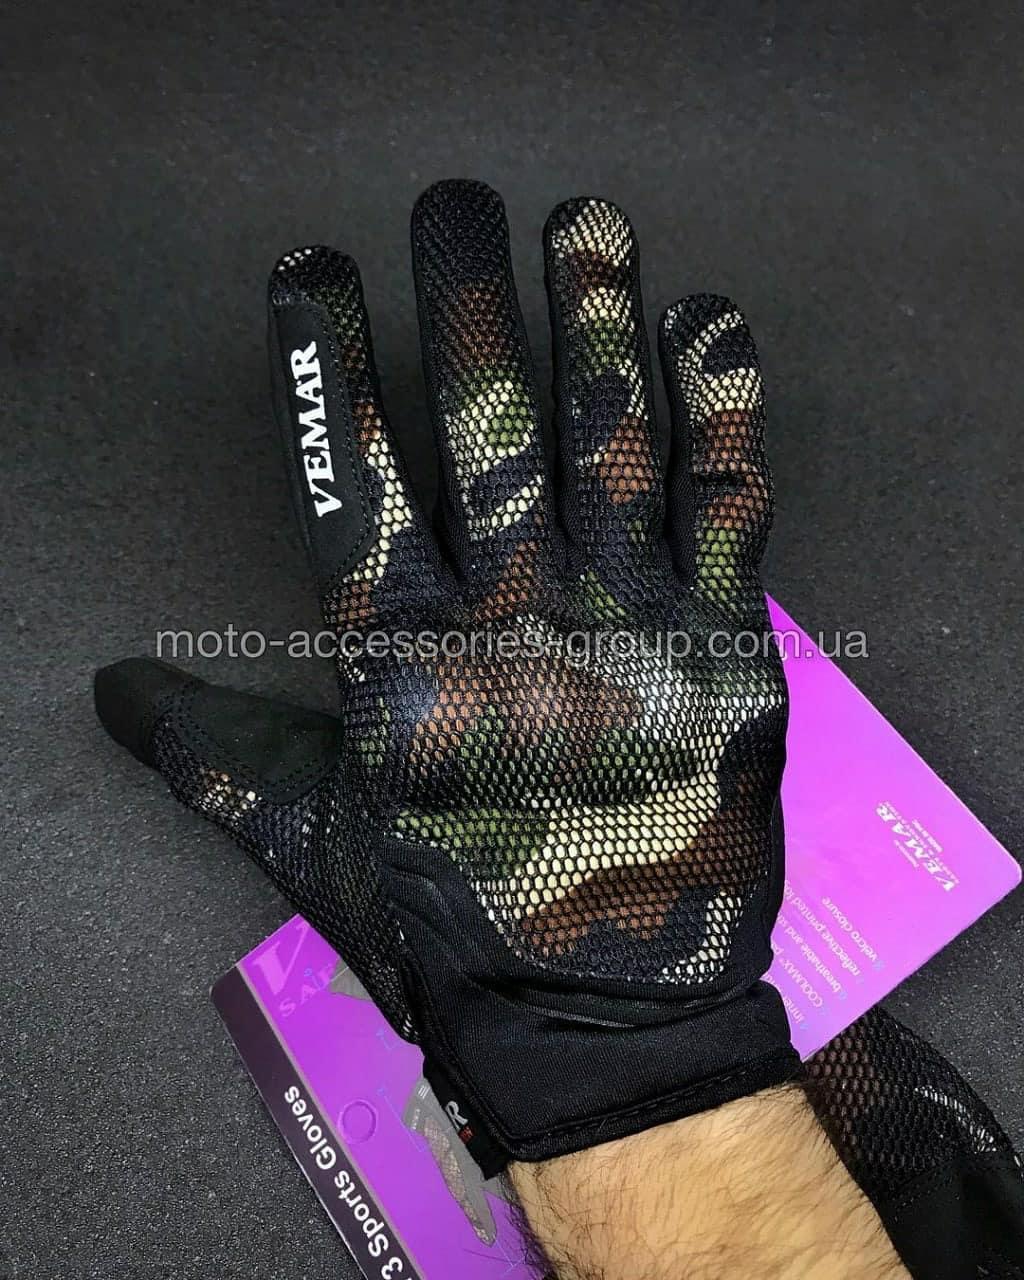 Мото перчатки VEMAR VE-173 (камуфляж)